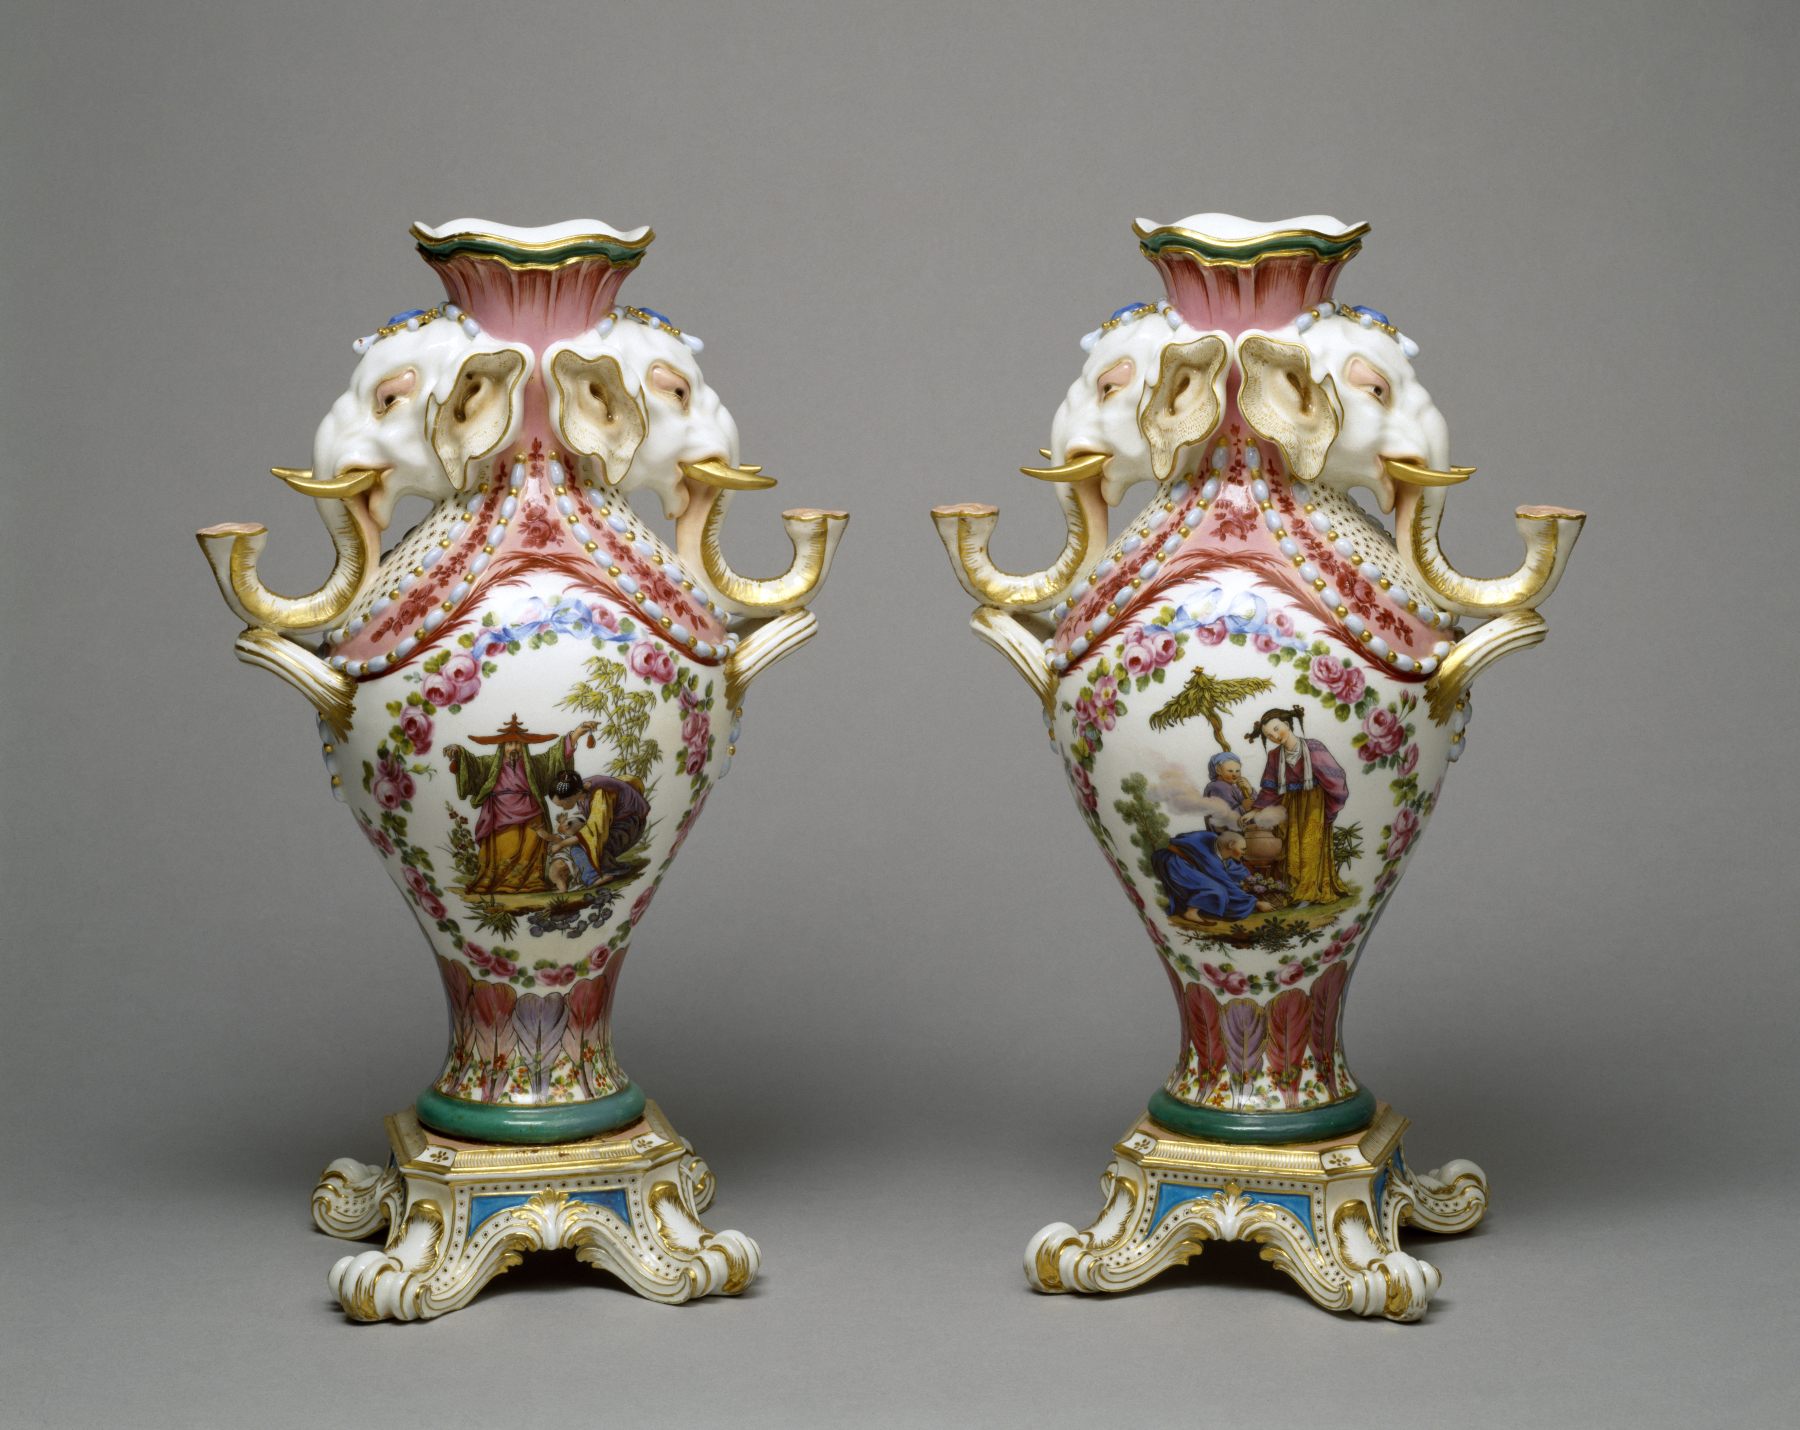 Hand Painted Royal Satsuma Porcelaine Cendrier